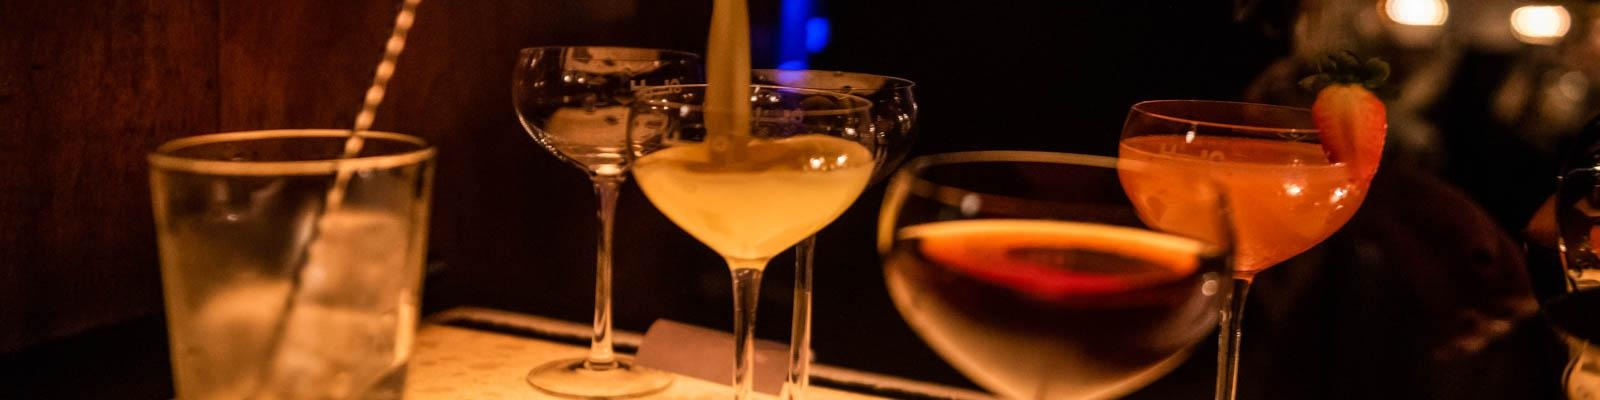 Top Speakeasies and Hidden Bars in NYC